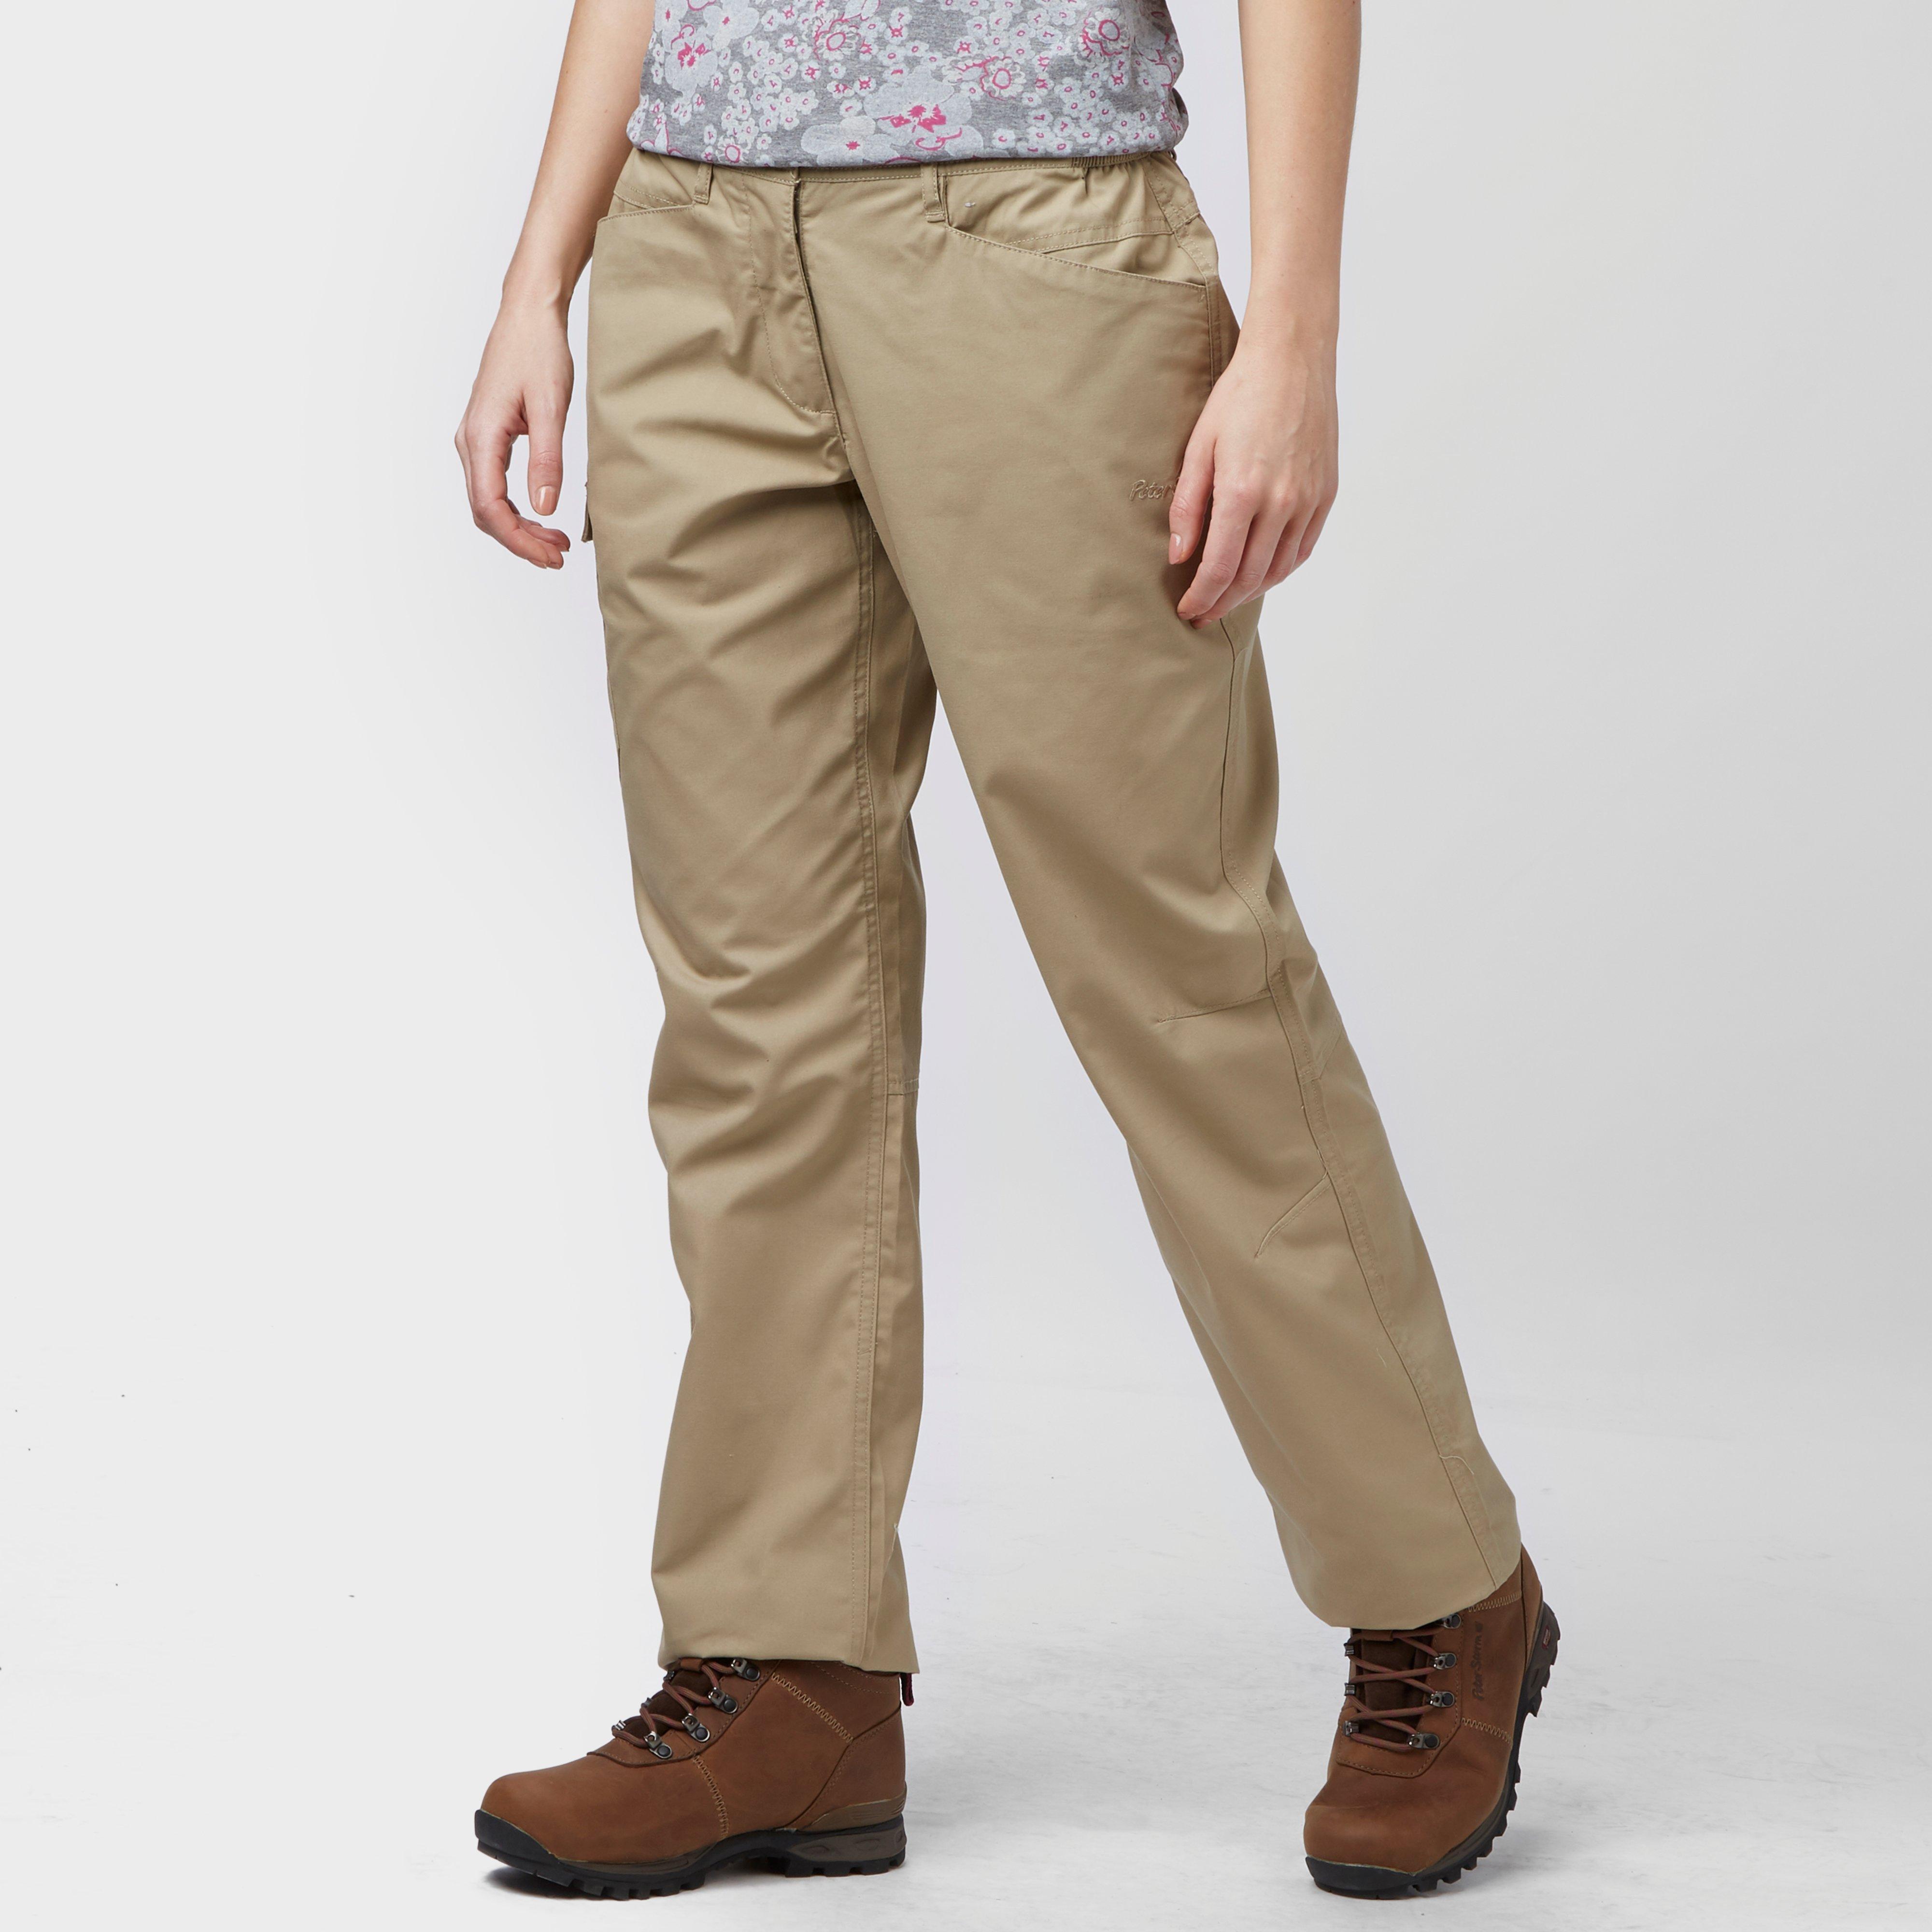 Peter Storm Peter Storm womens Ramble II Trousers (Long) - Beige, Beige